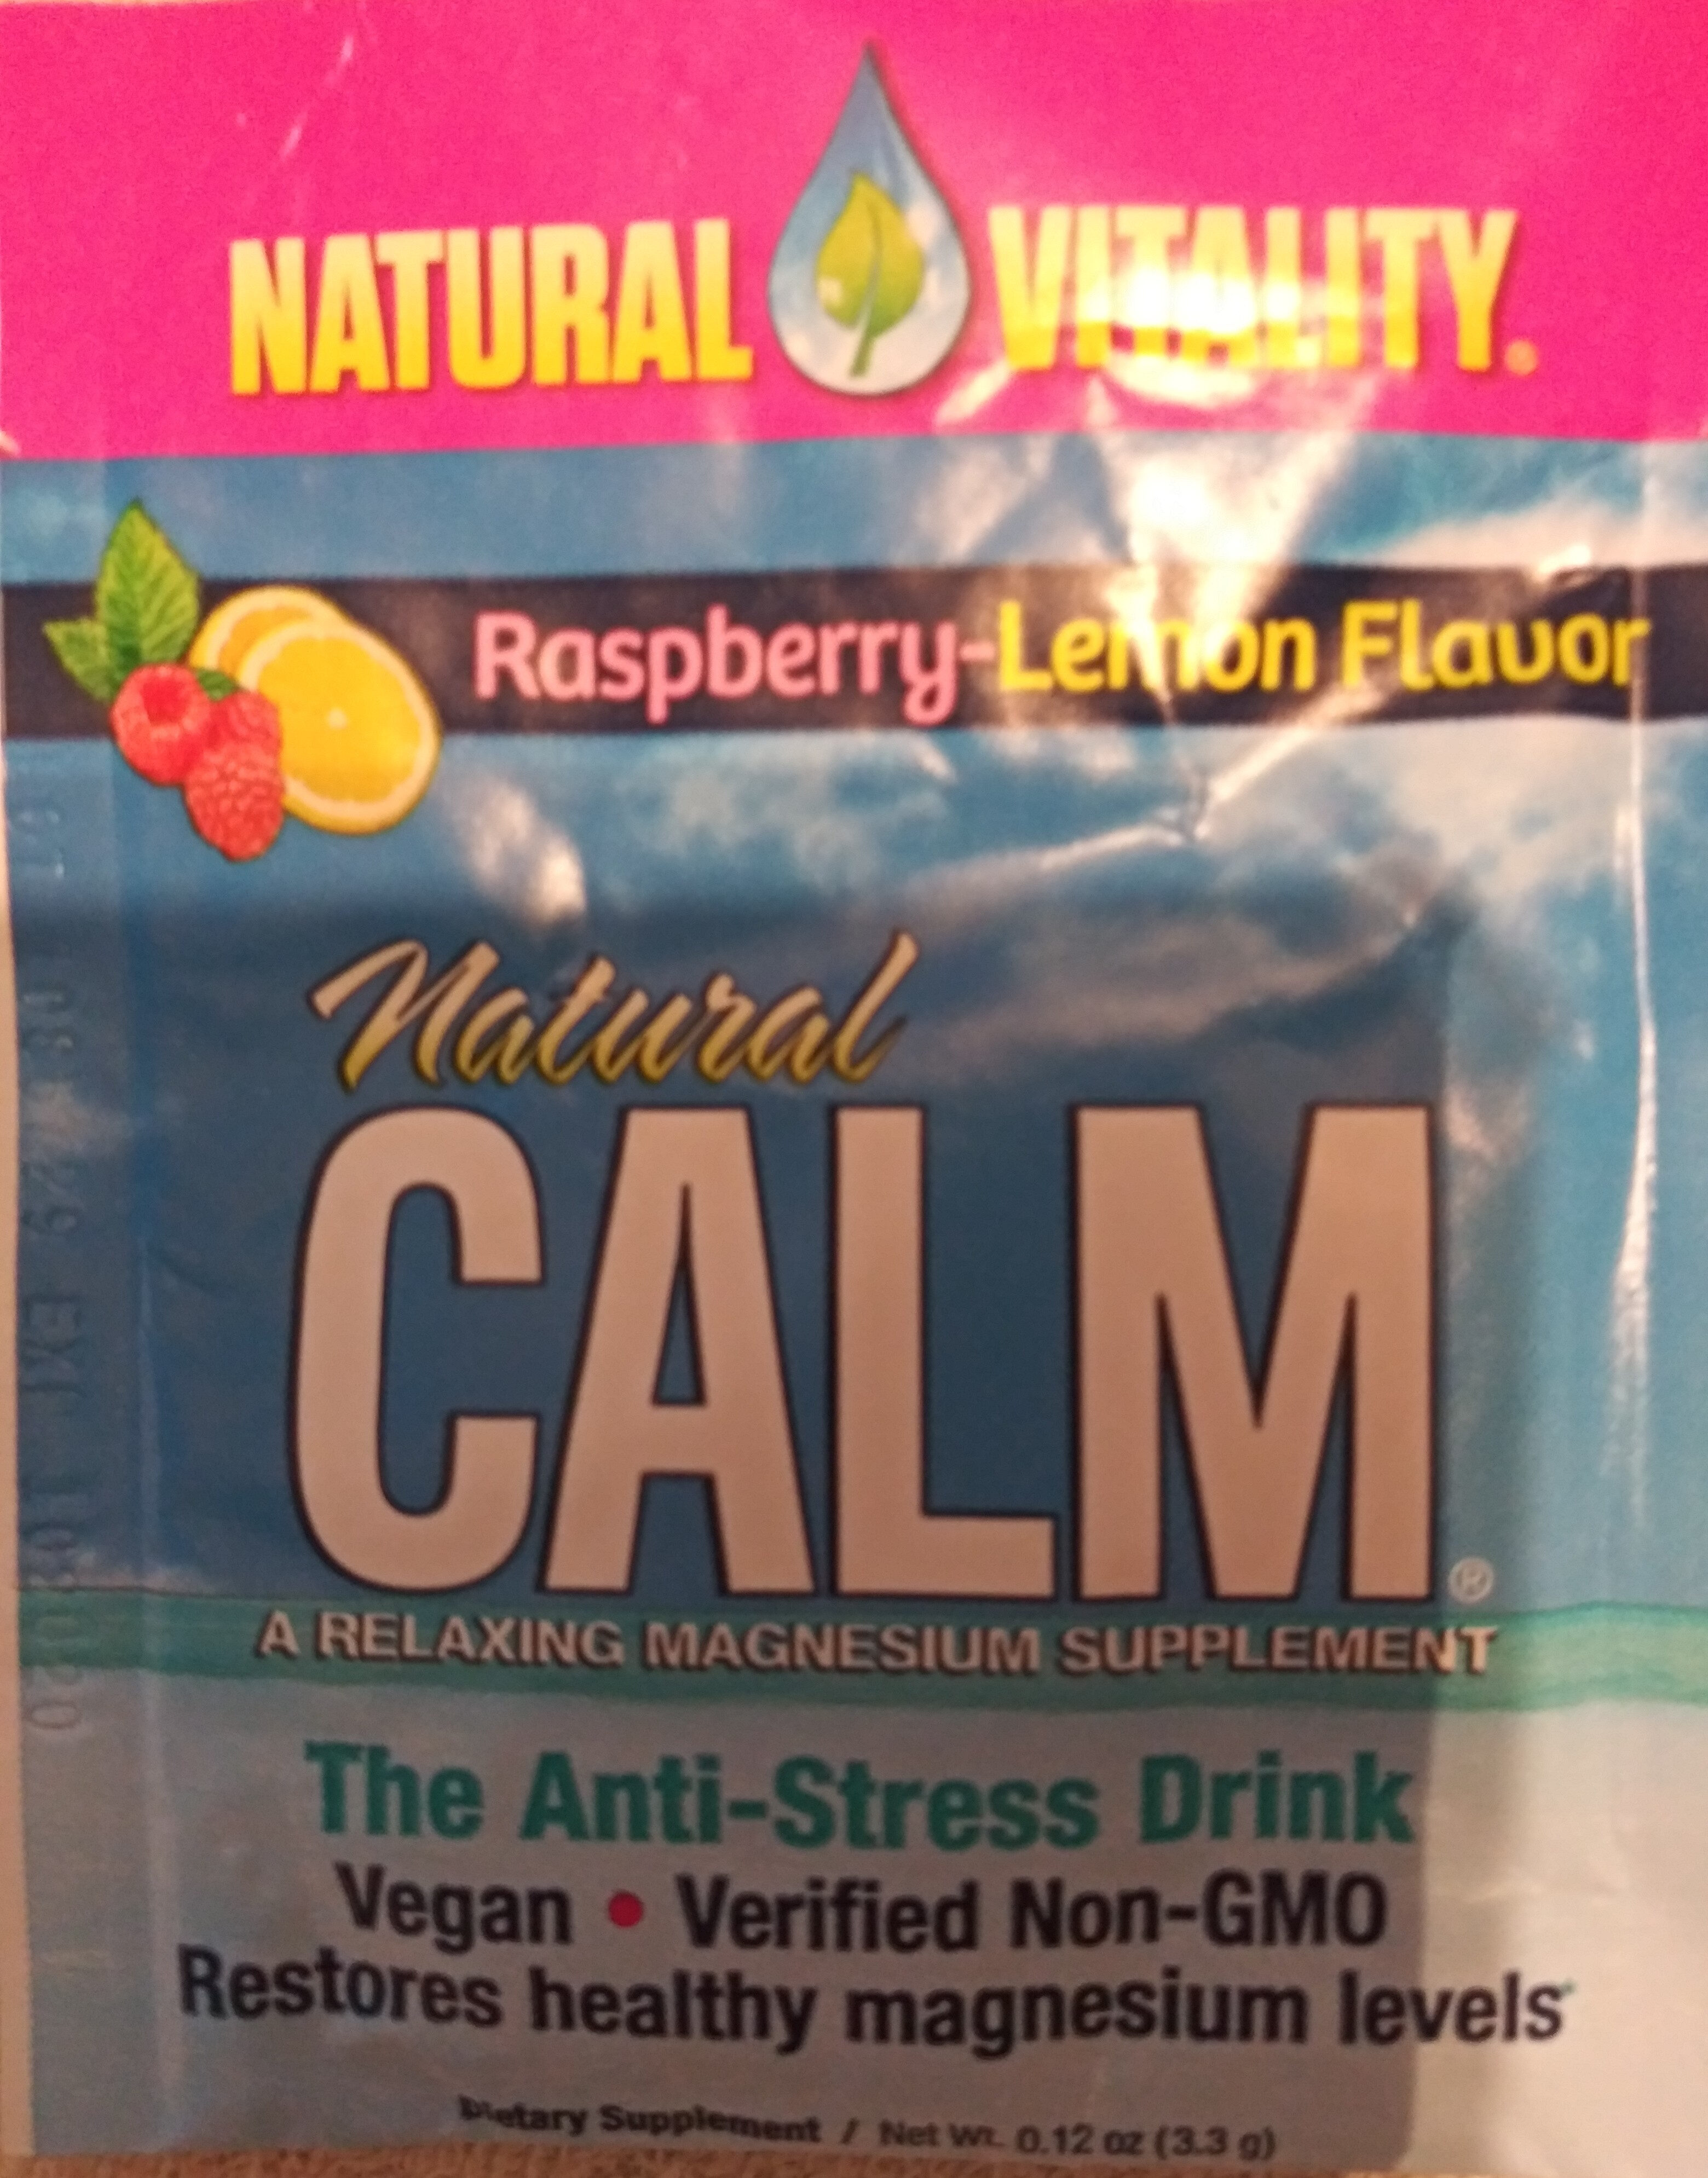 Natural Calm Raspberry-Lemon Flavor - Product